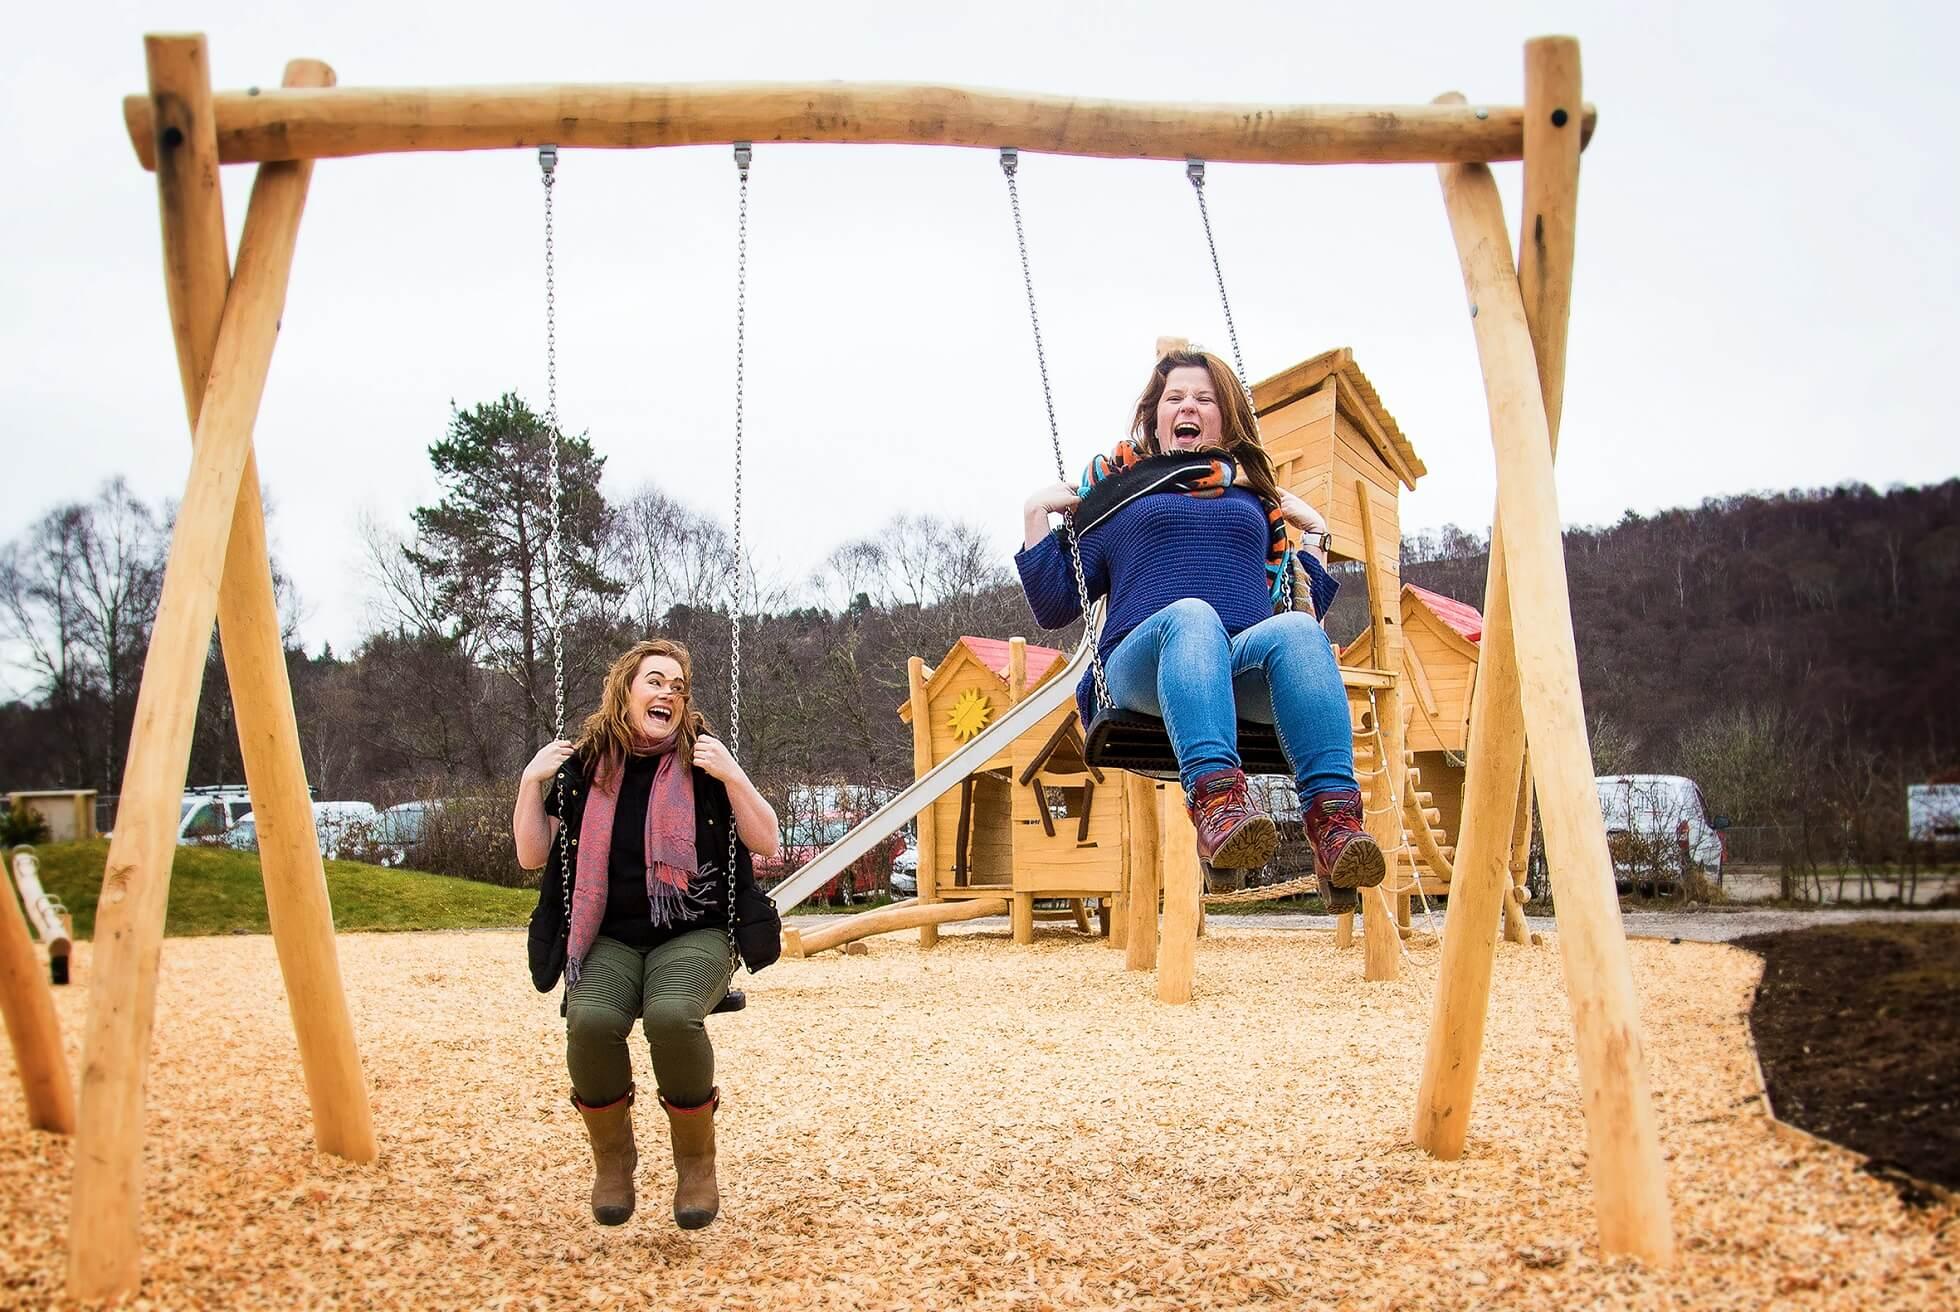 Image of Playpark